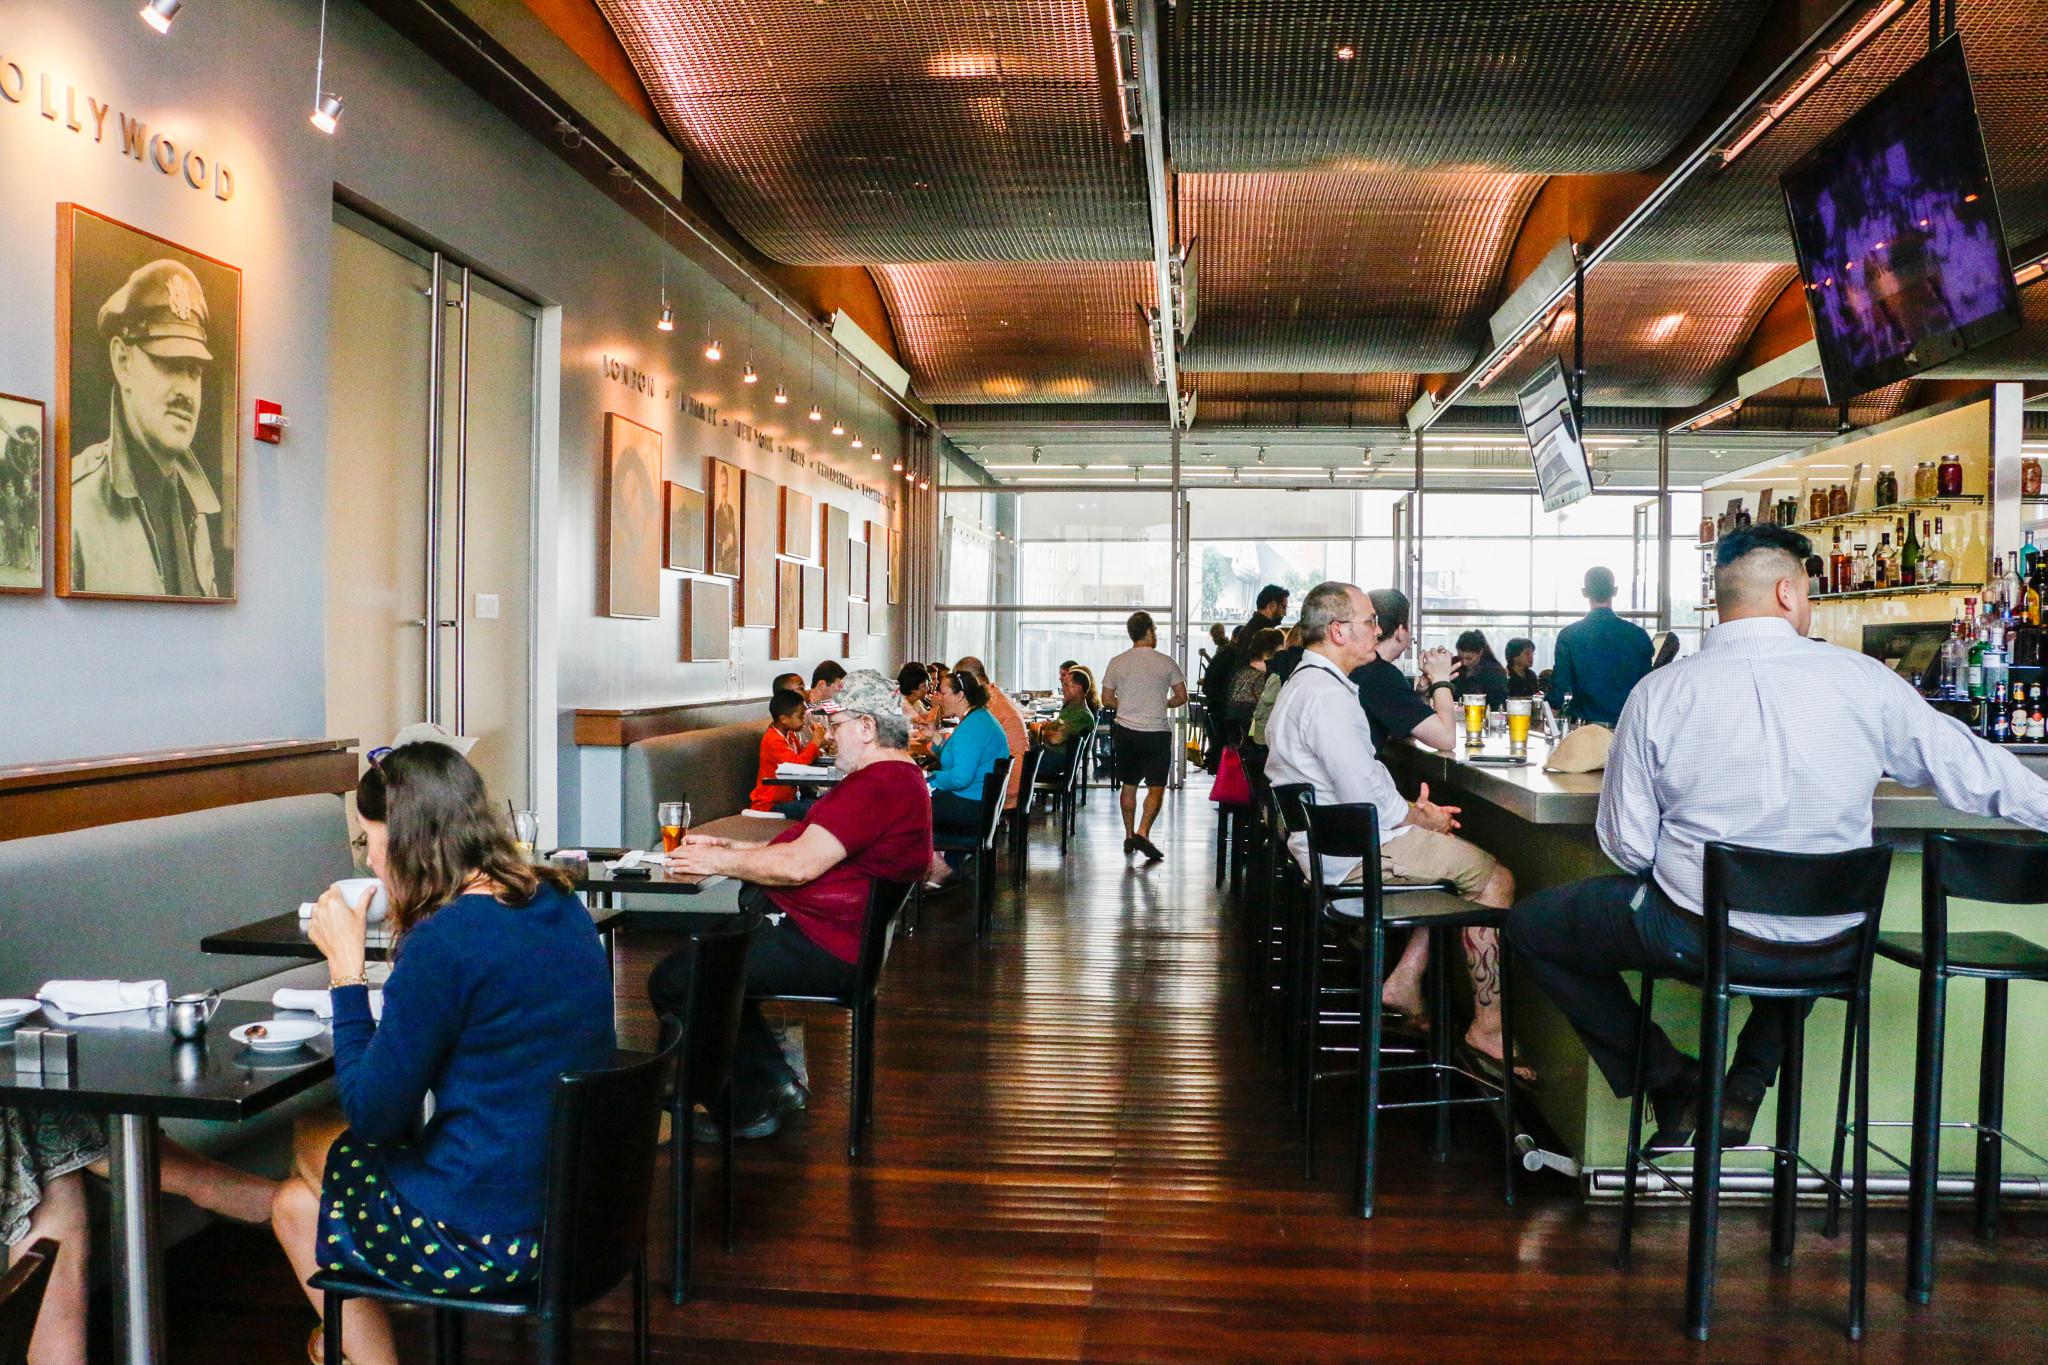 Inside The American Sector restaurant. (Photo: Rebecca Ratliff)